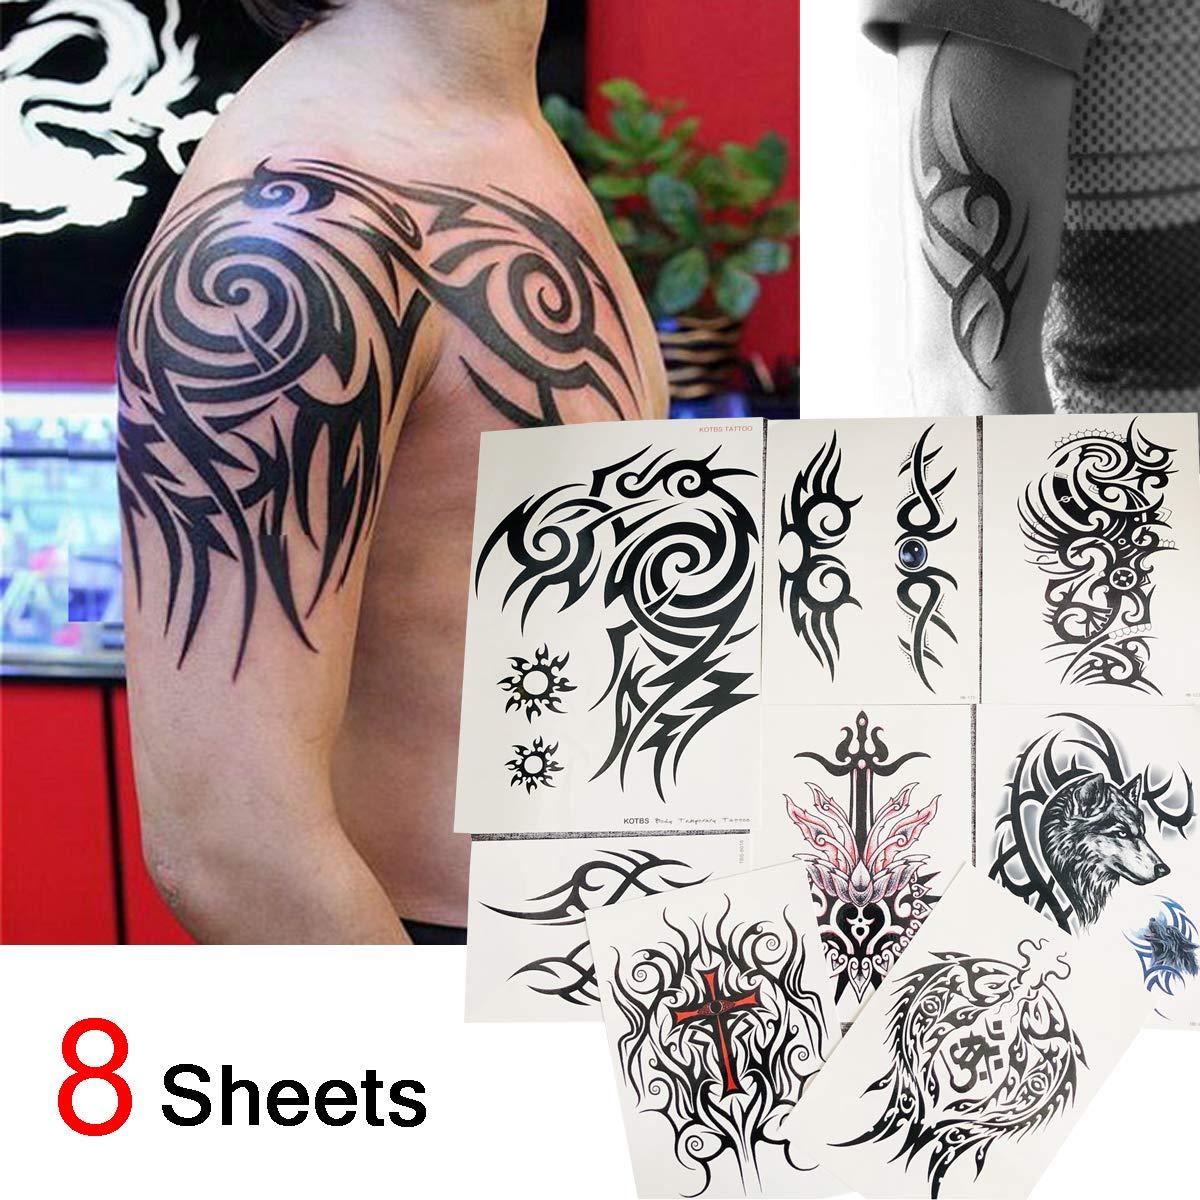 Kotbs 8 Sheets Waterproof Large Temporary Tattoos Men Tribal Totem Tattoo Sticker Make up Body Art Fake Tattoo